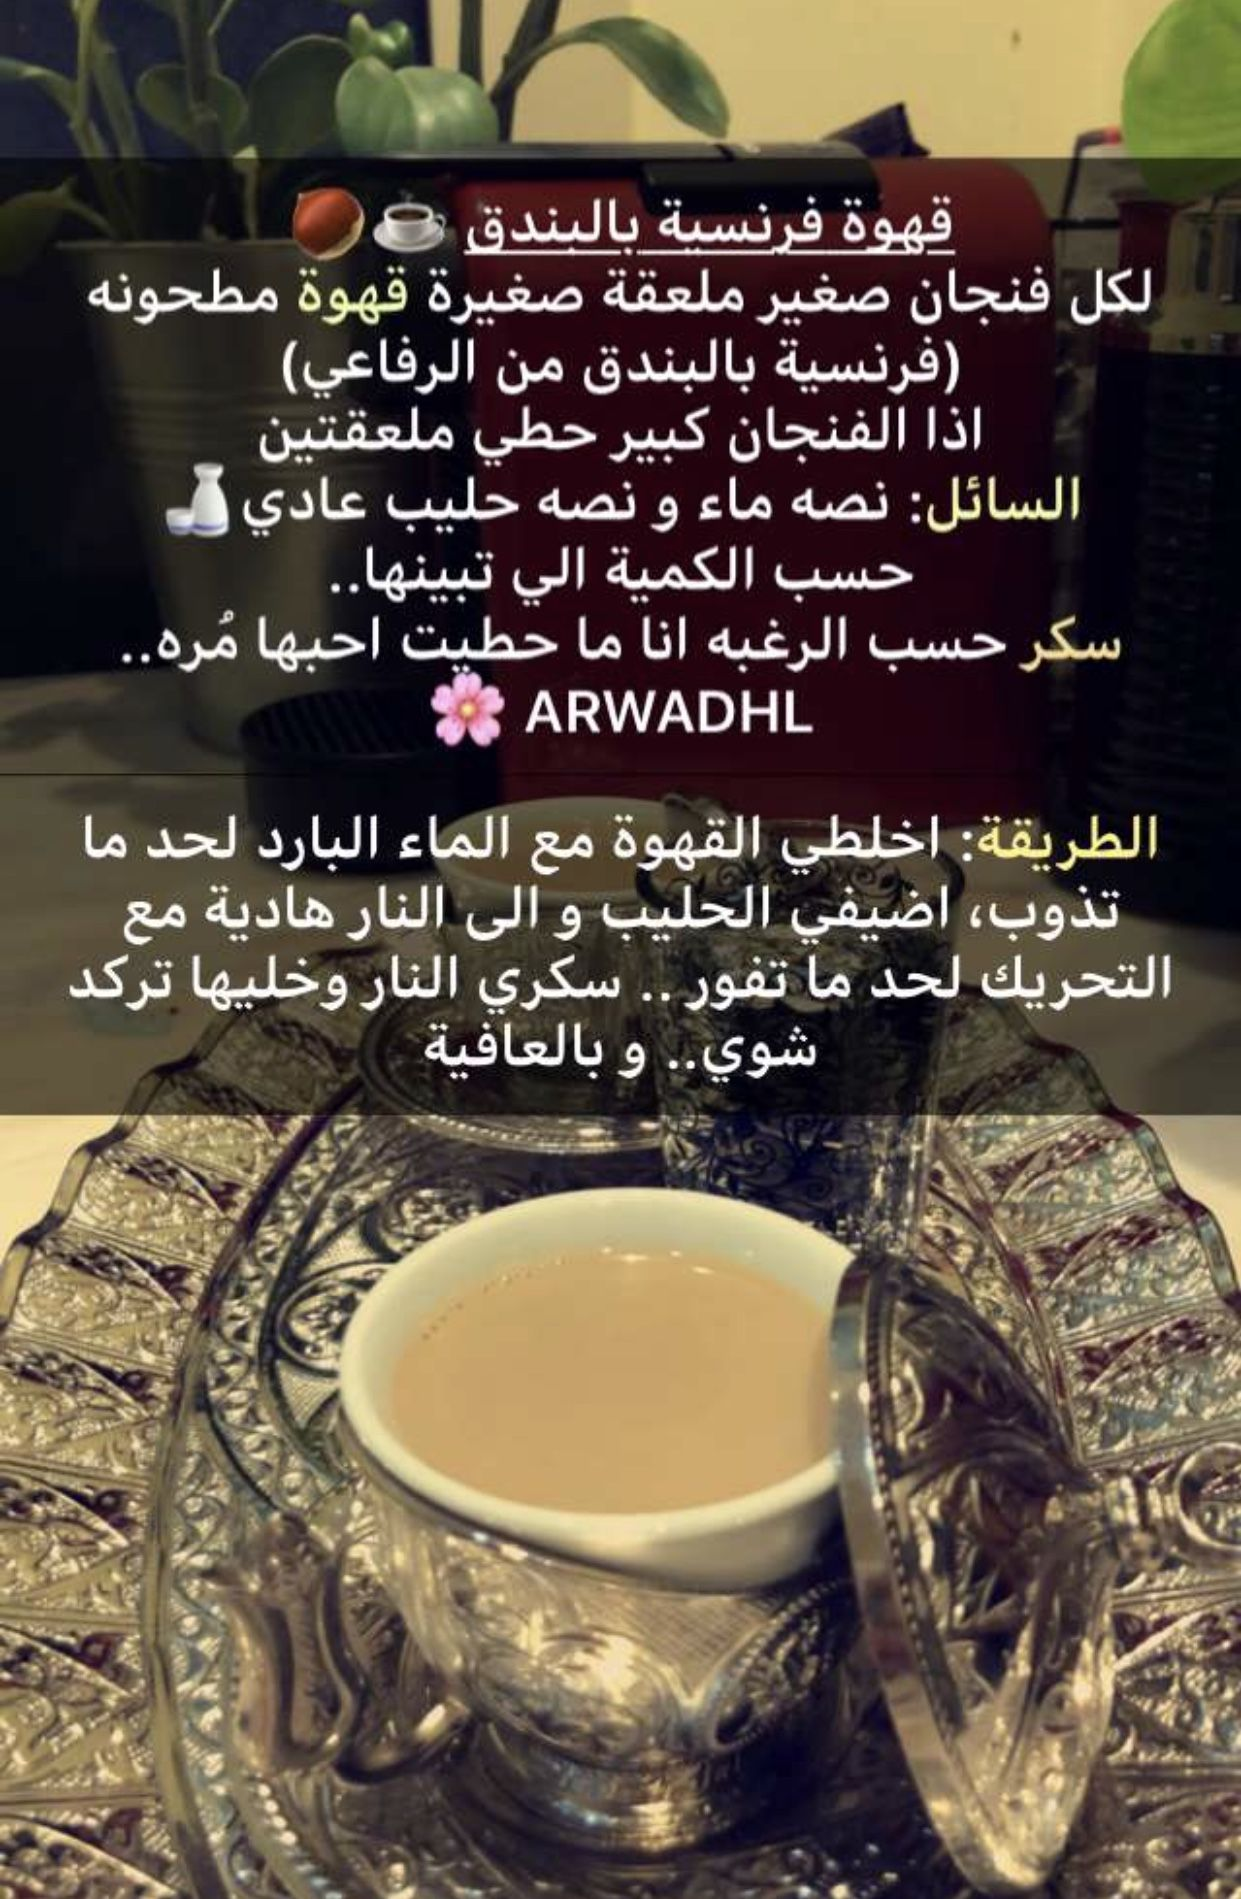 Pin By Eshaa Alnajjar On طبخ واكل Food Drinks Dessert Coffee Recipes Hot Coffee Drink Recipes